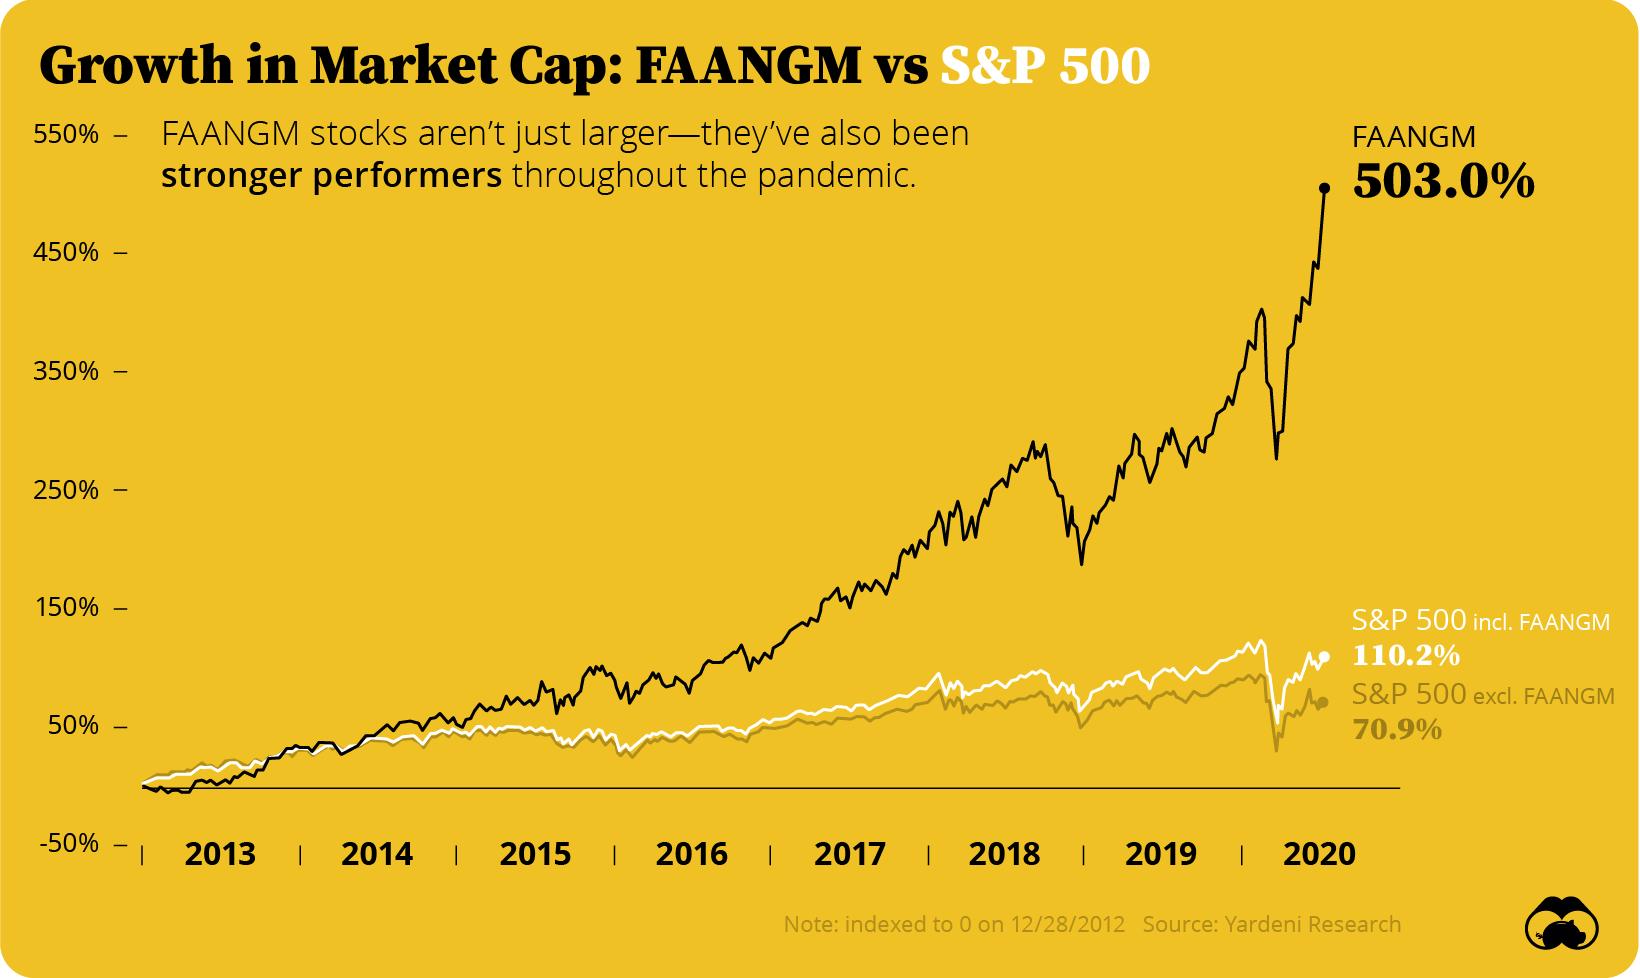 faangm vs sp500